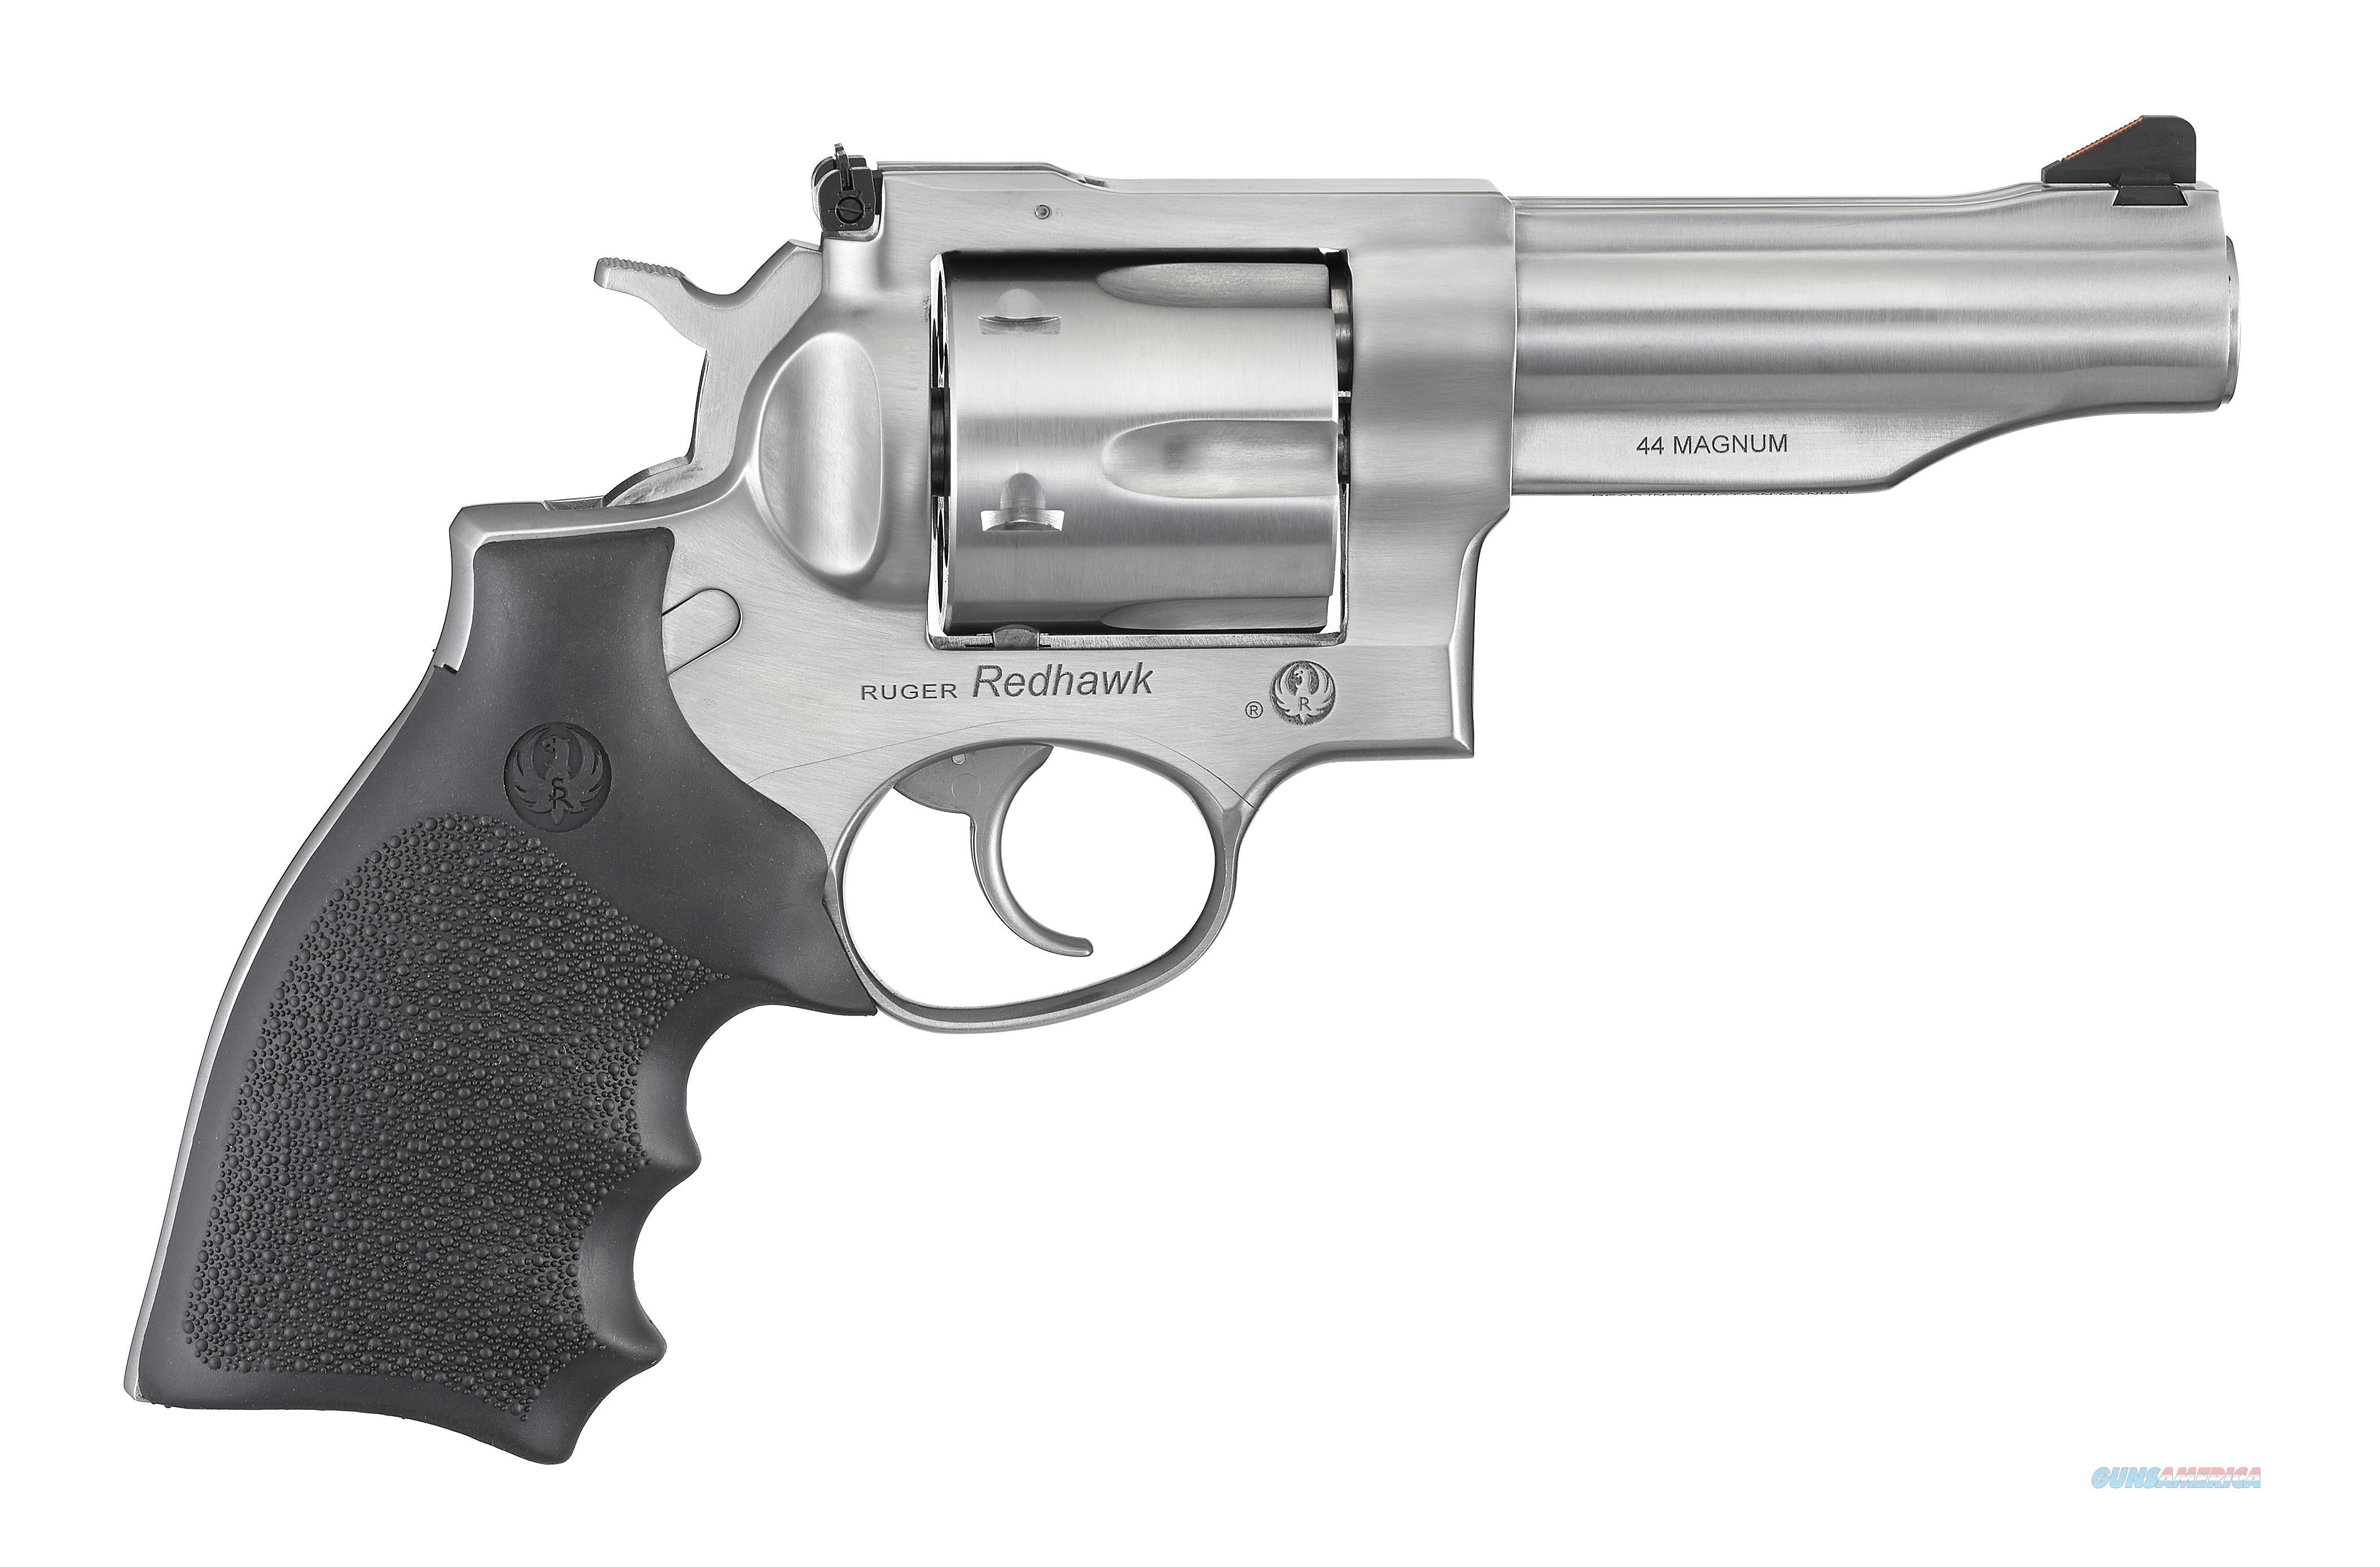 Ruger Redhawk Big Bore Revolver 44 Reming For Sale